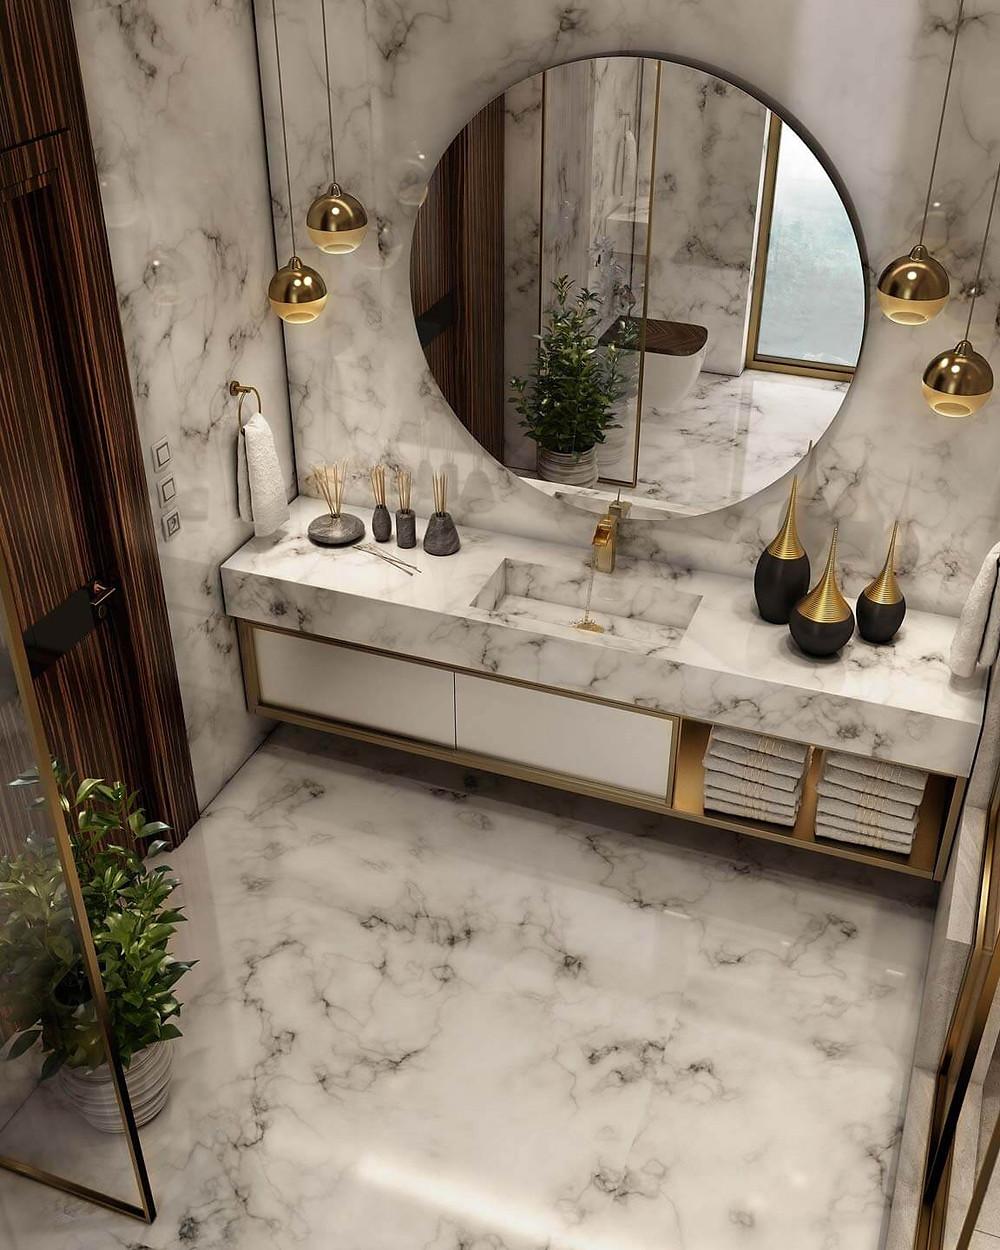 luxurious bathroom decor on a set budget by Barbulianno Design